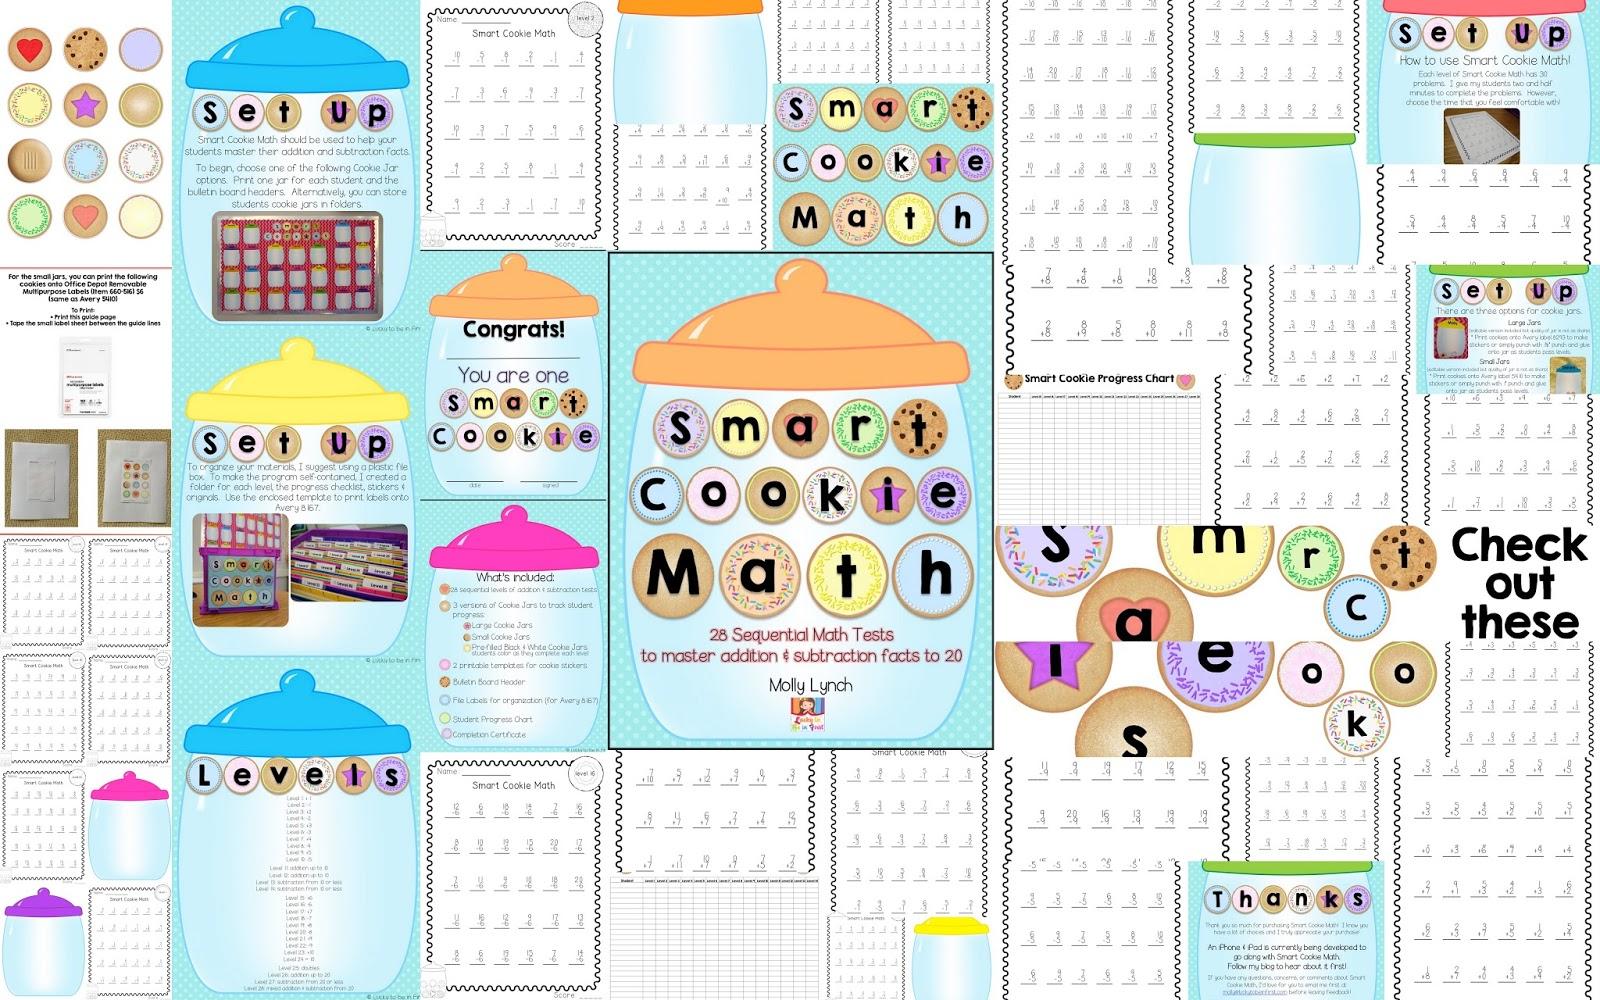 Smart Cookie Math - A Program to Master Basic Math Facts